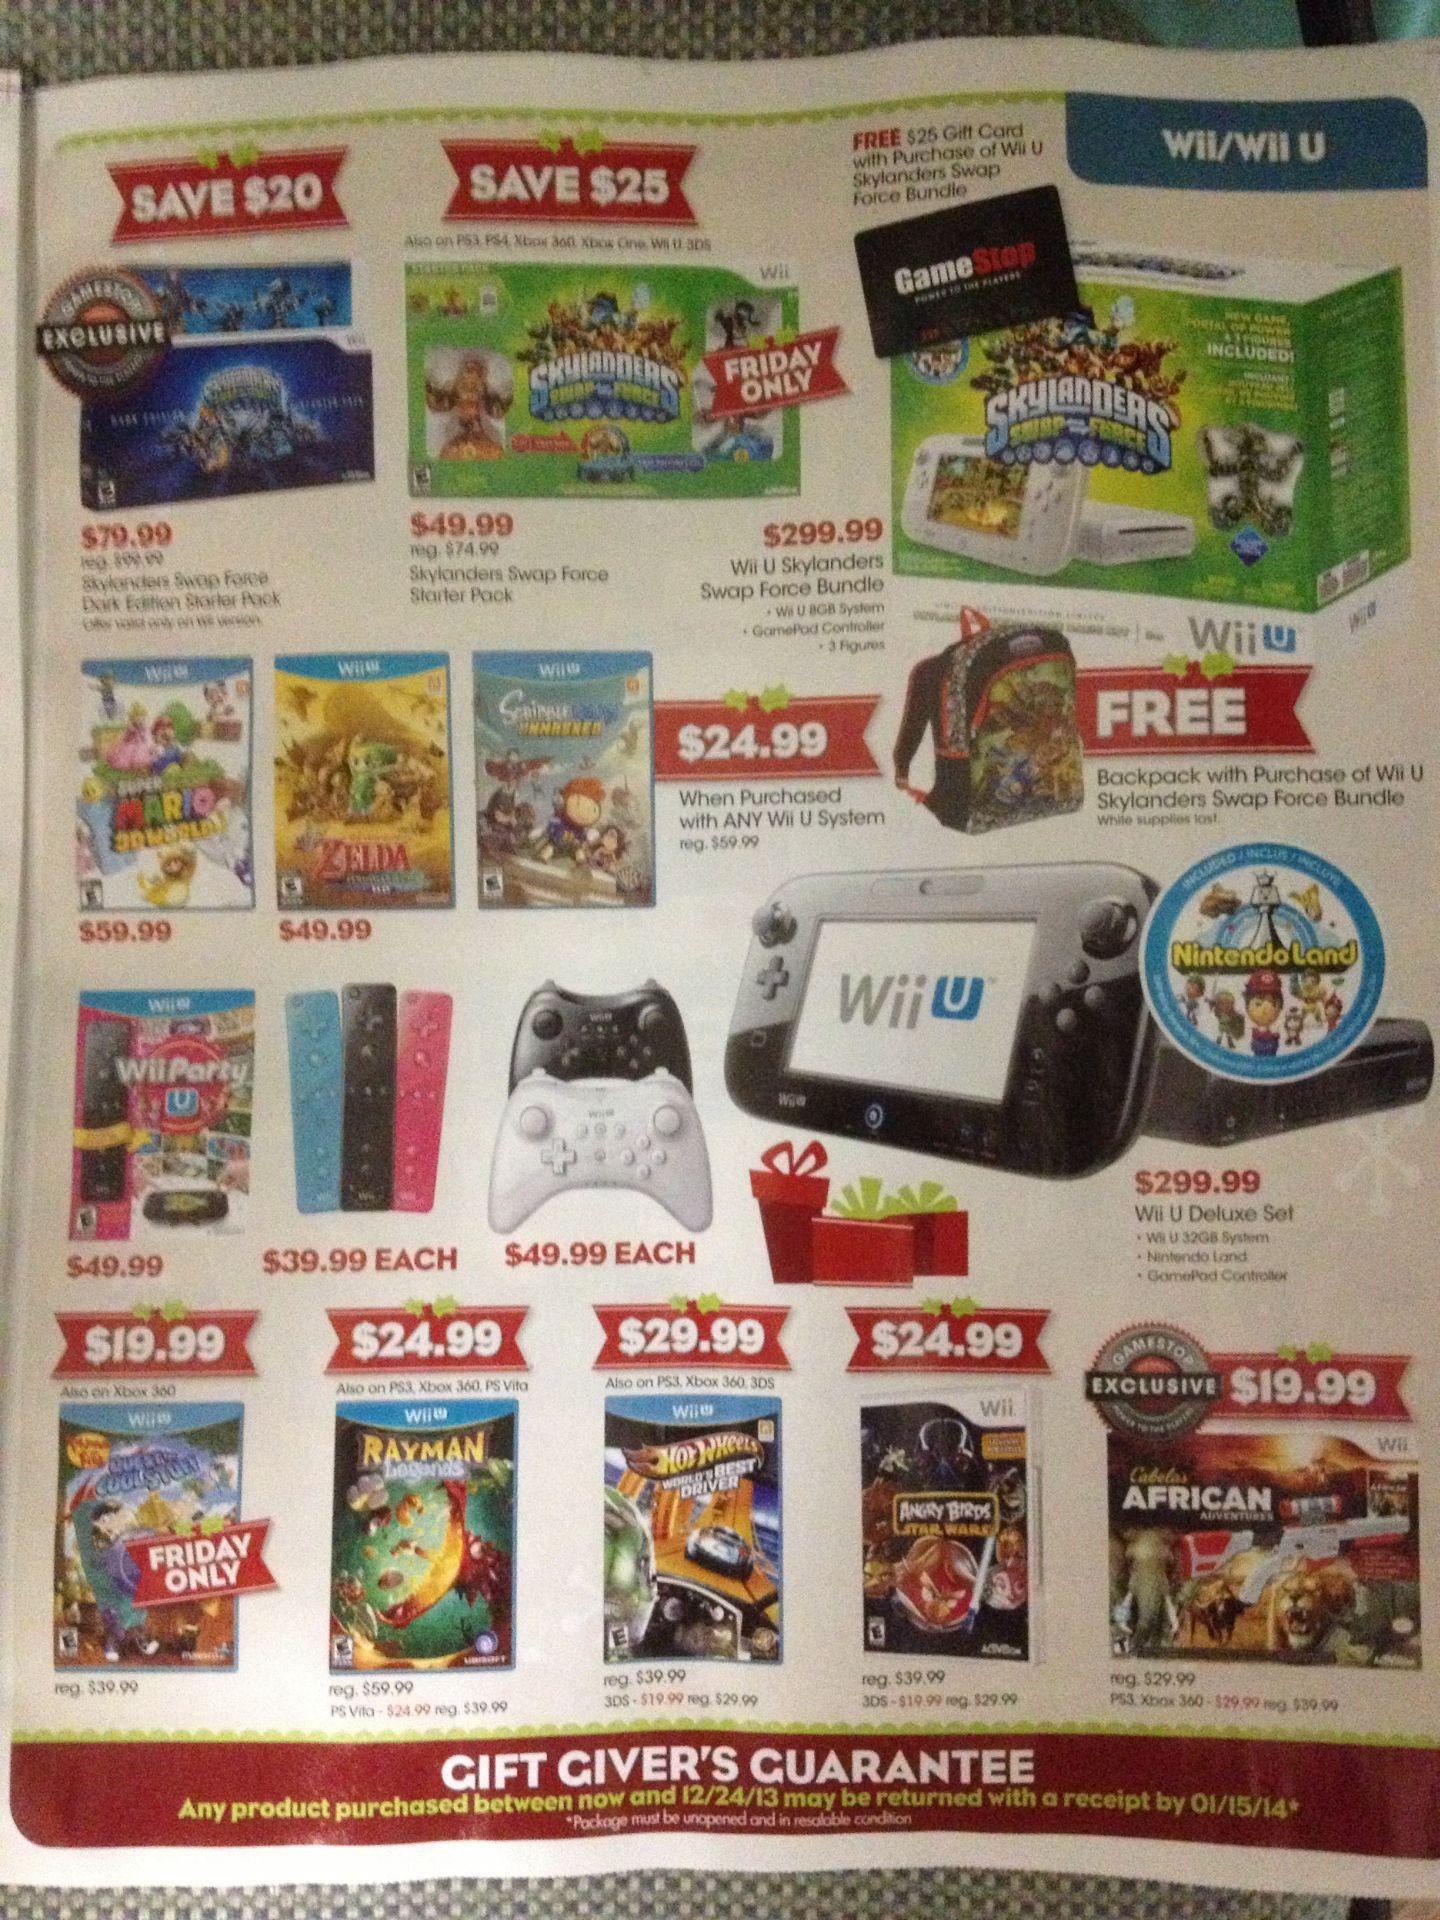 Gamestop S Leaked Black Friday 2013 Deals Full Flyer Nintendo Everything